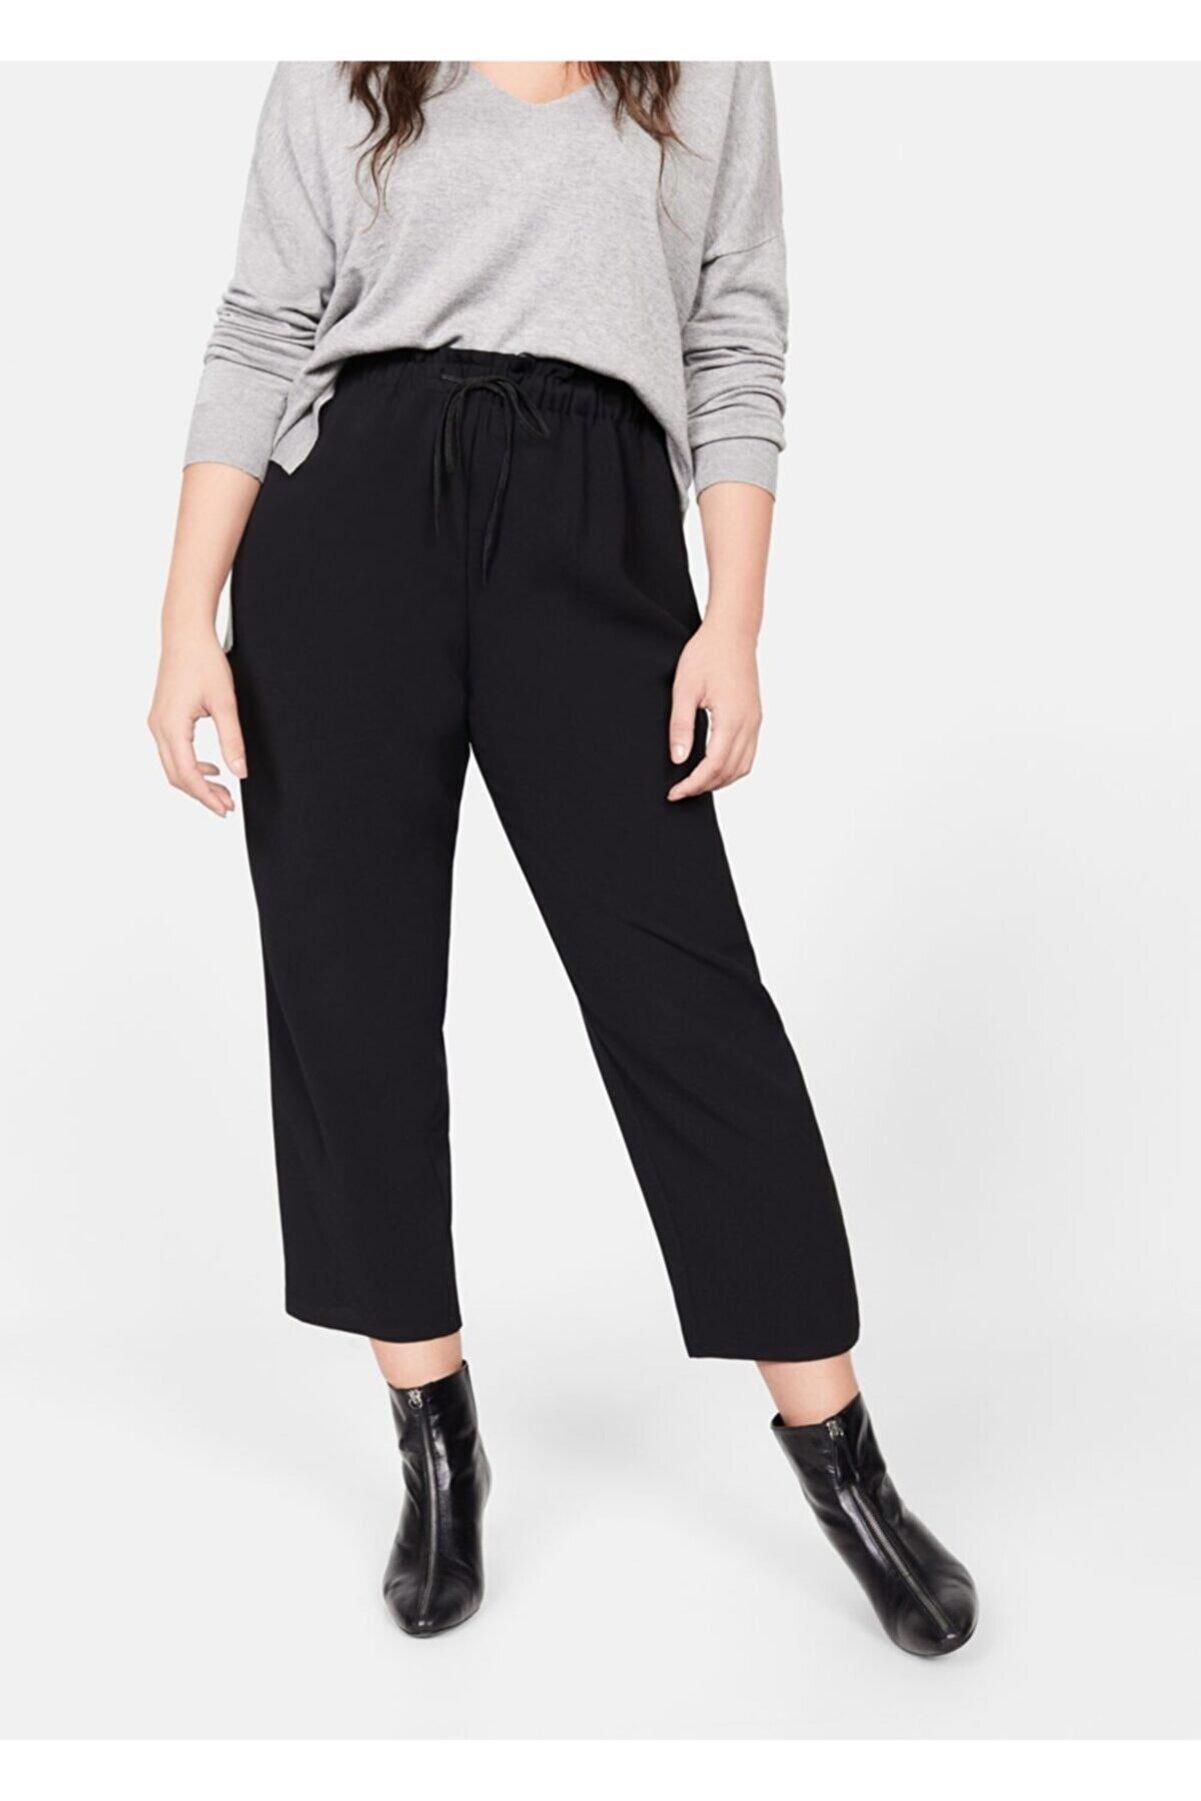 Violeta by MANGO Kadın Siyah Beli Elastik Pantolon 61110630